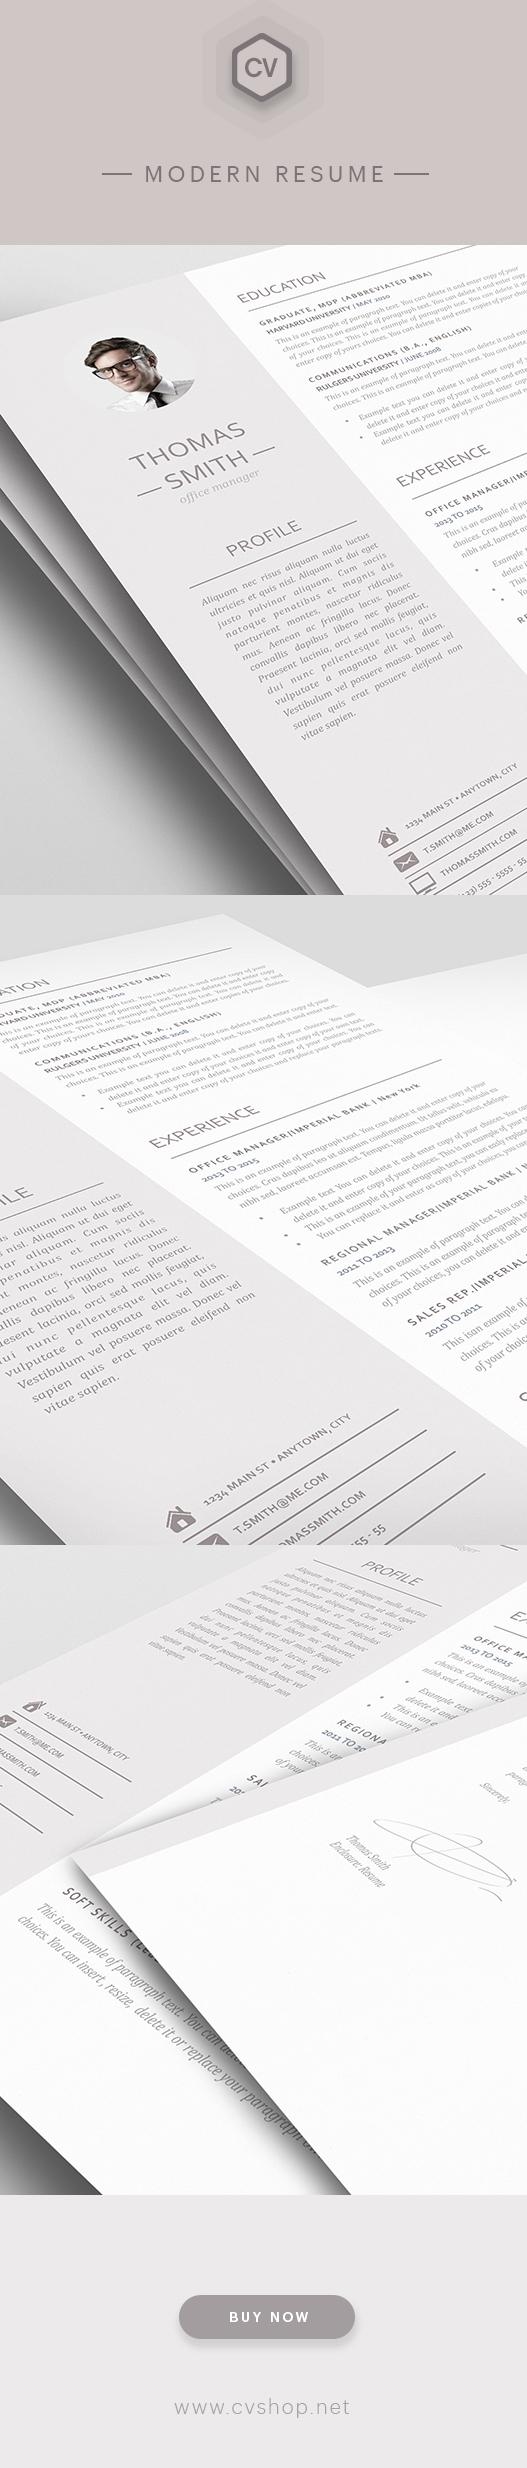 Resume Template  Modern Resume Templates  CvshopNet